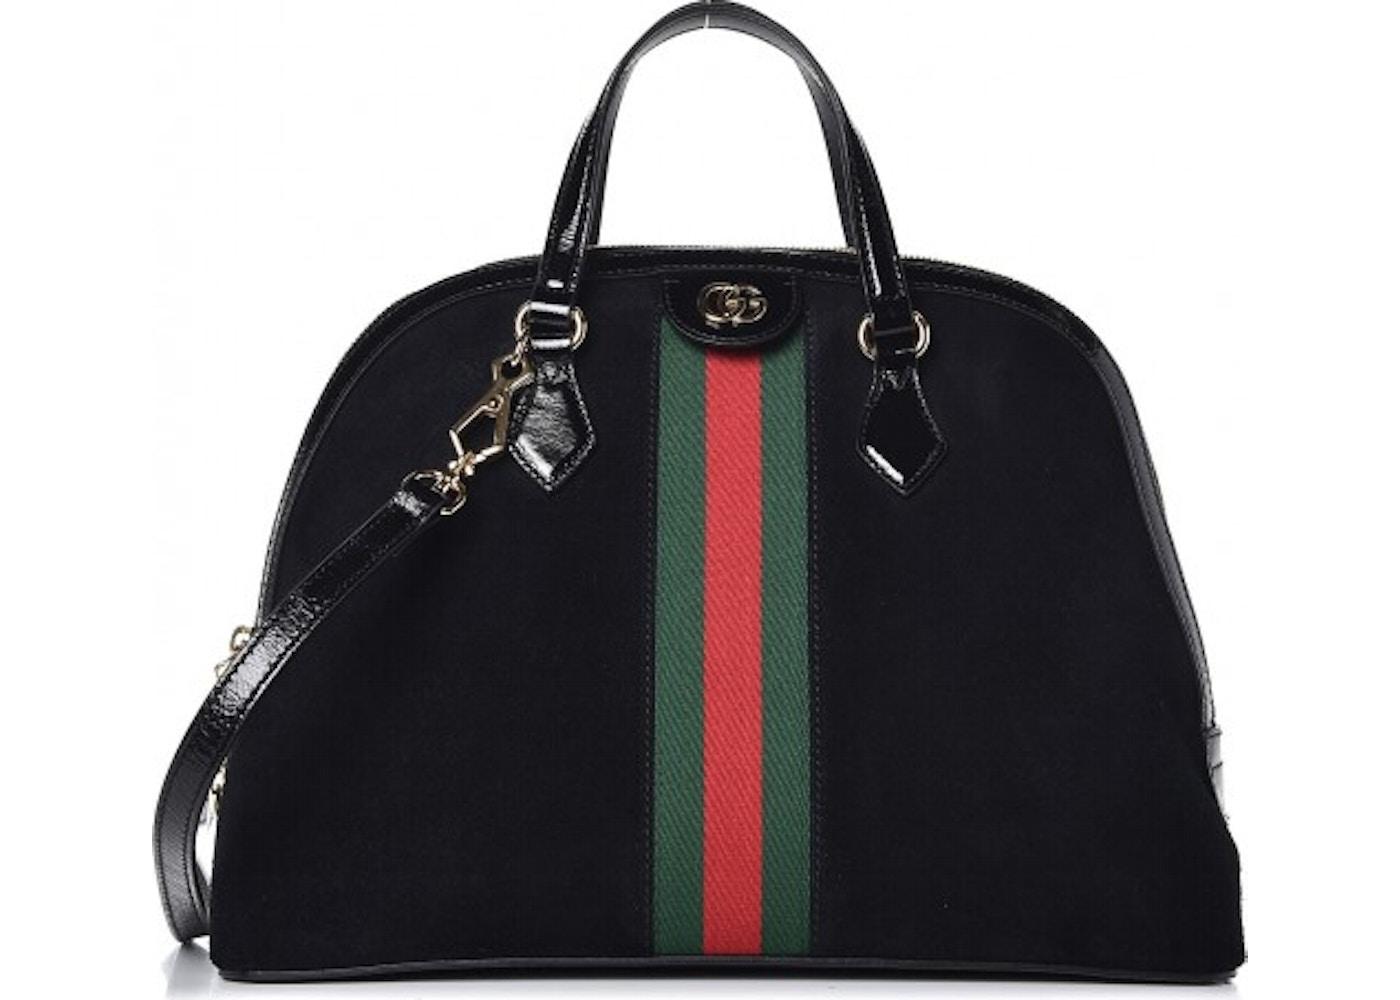 806684bd7a6 Gucci Ophidia Top Handle GG Web Medium Black. GG Web Medium Black